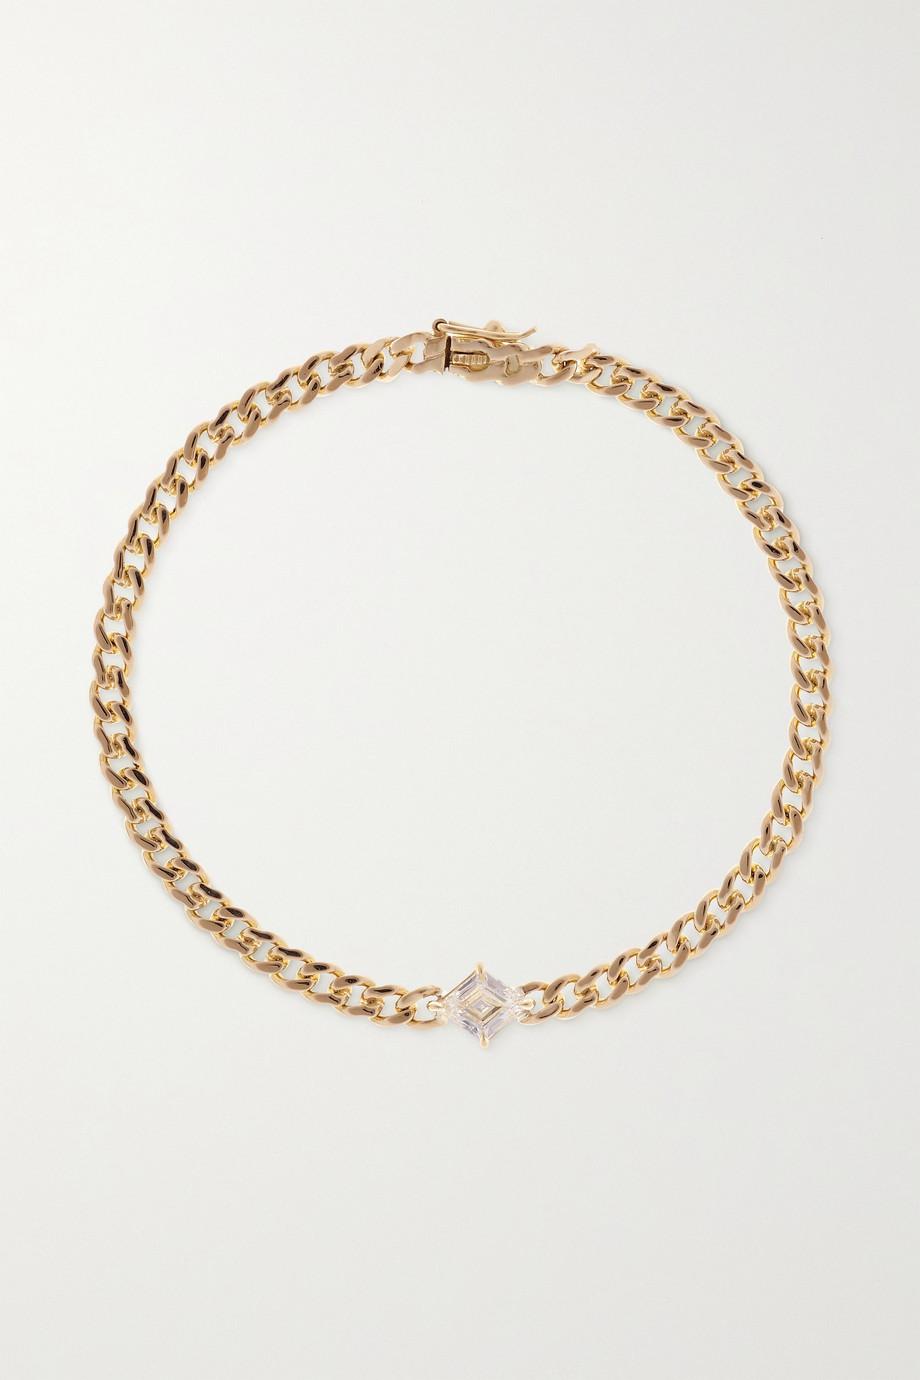 Anita Ko Bracelet en or 18carats (750/1000) et diamant